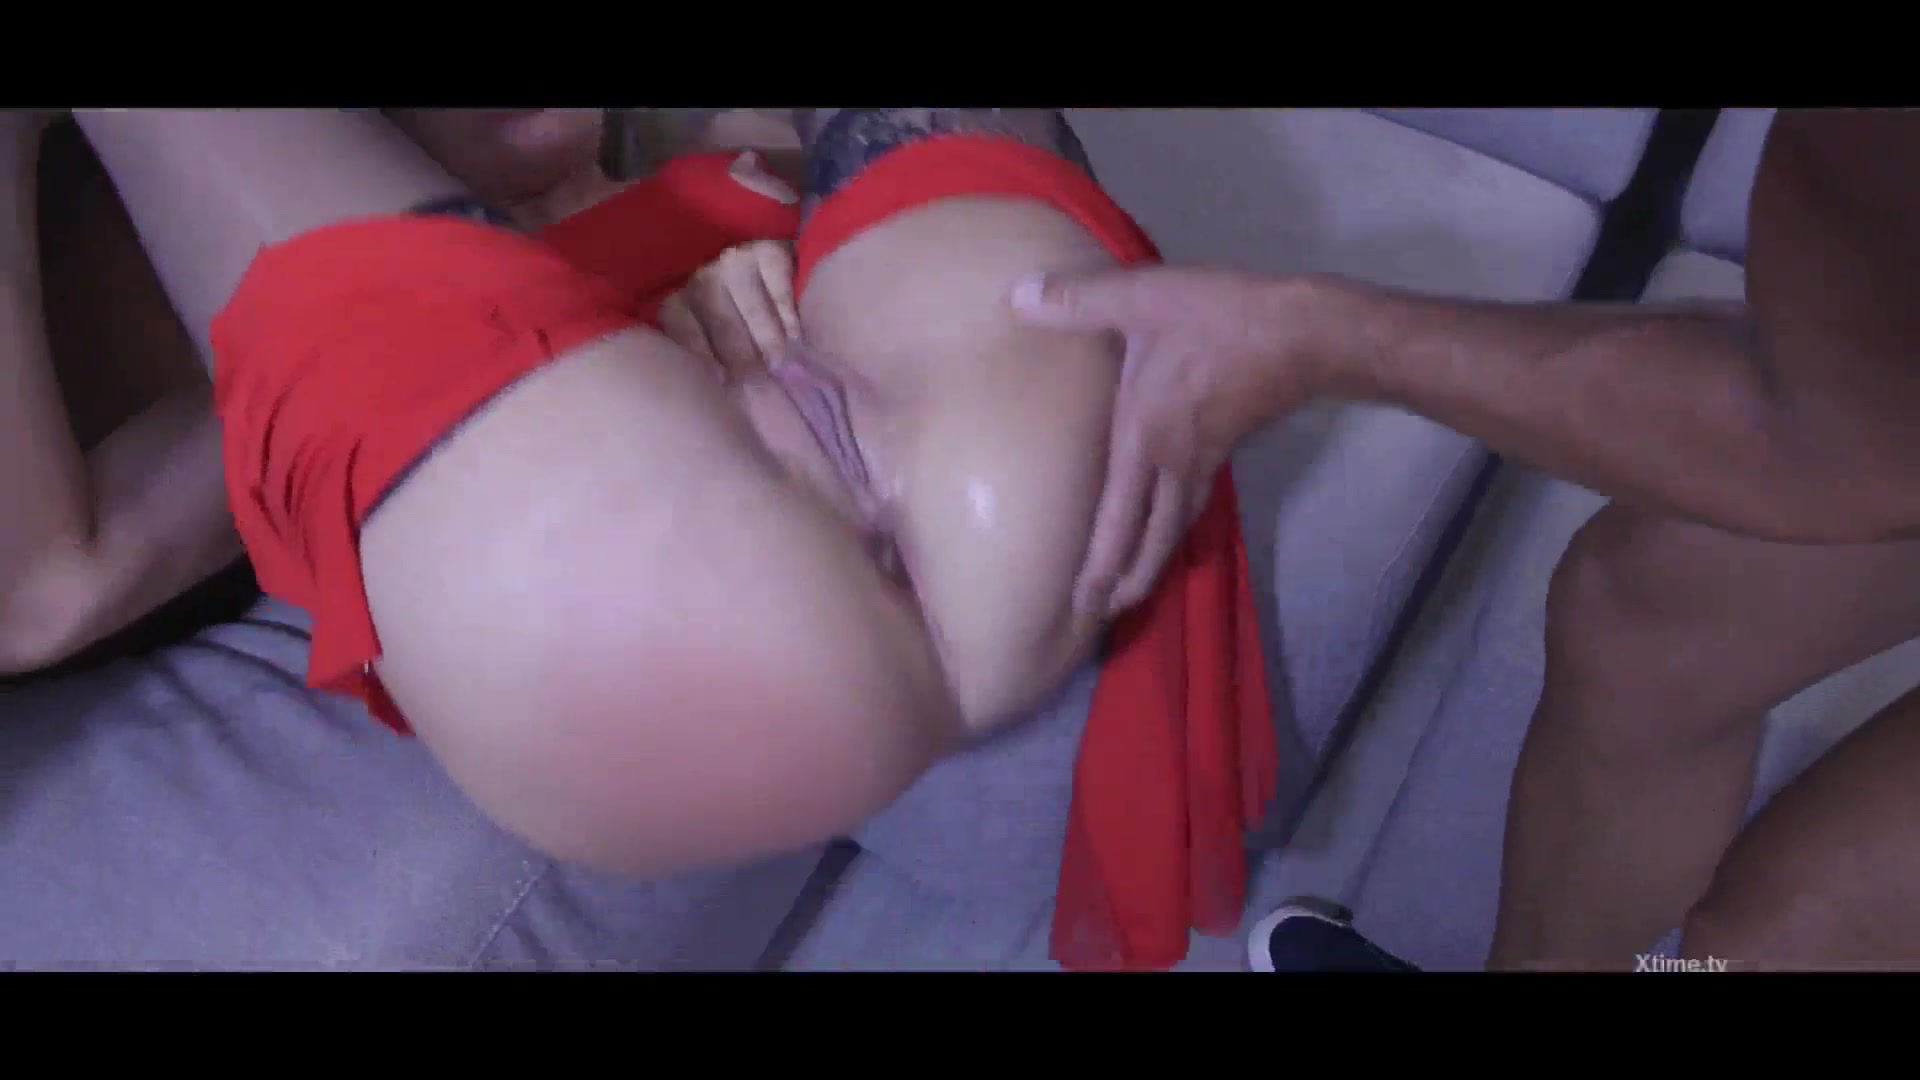 Hot naked photos of vanessa marcil